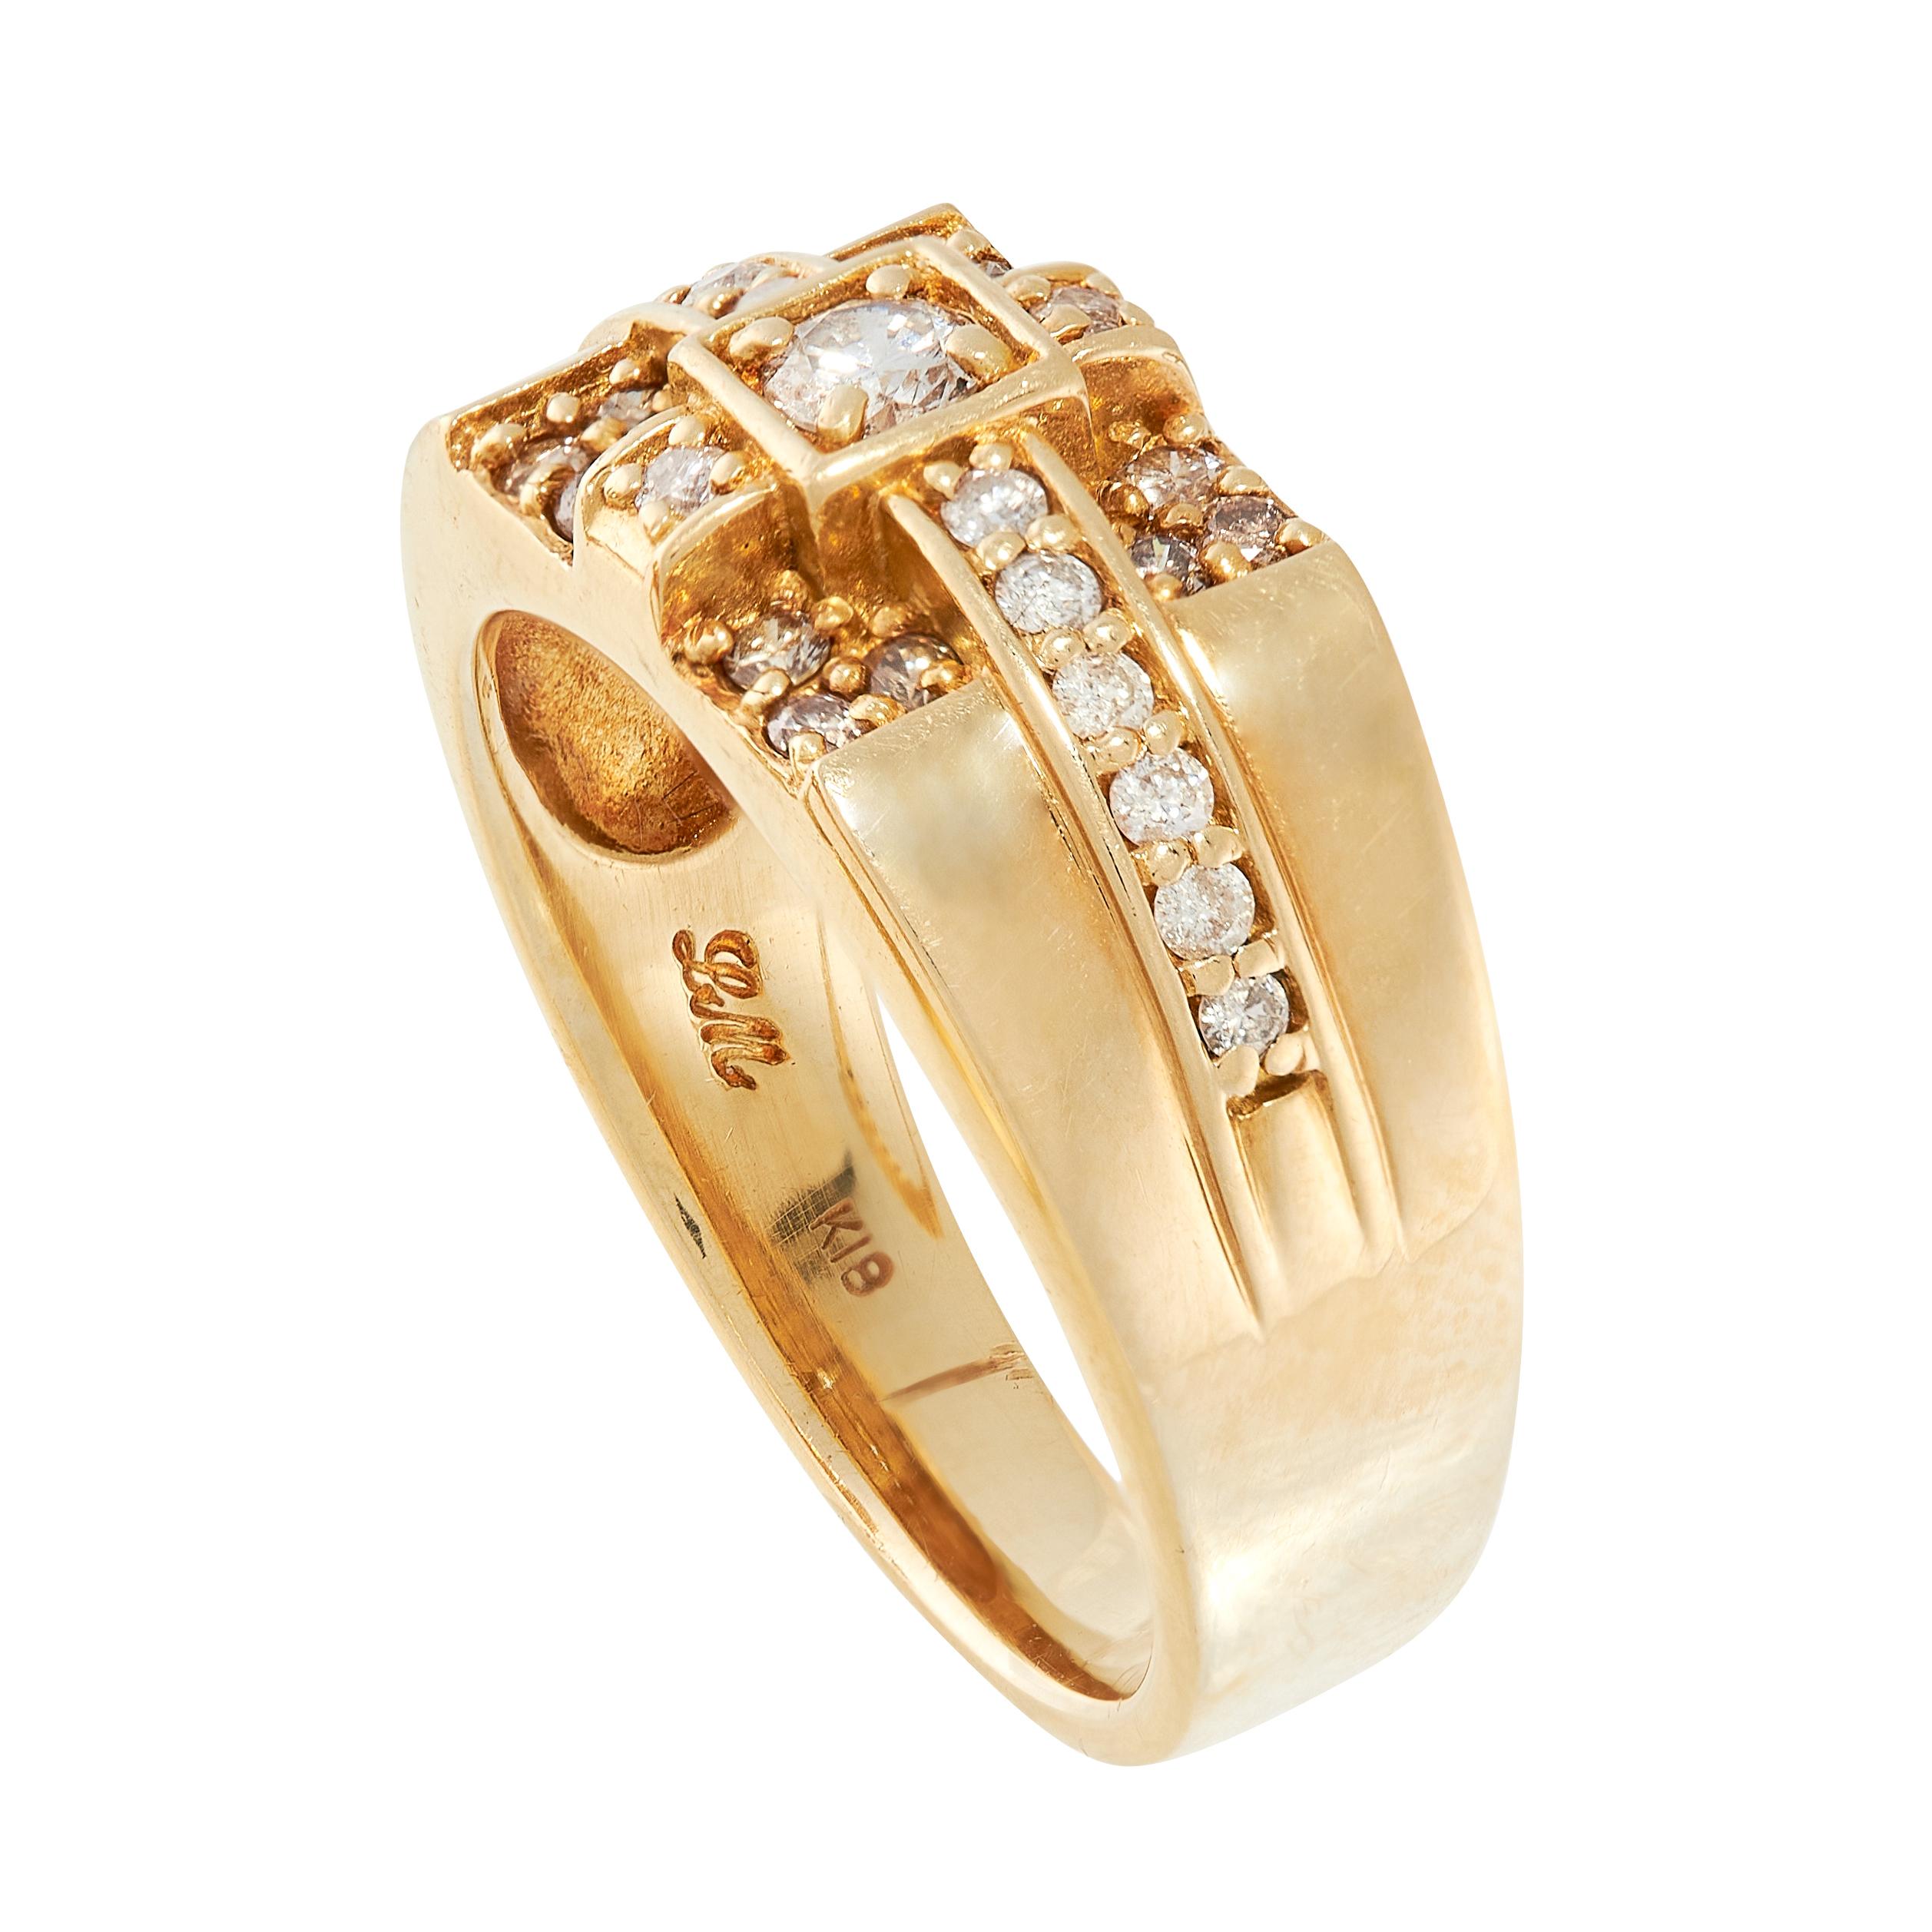 A DIAMOND DRESS RING in 18ct yellow gold, set with round cut diamonds, full British hallmarks, - Image 2 of 2